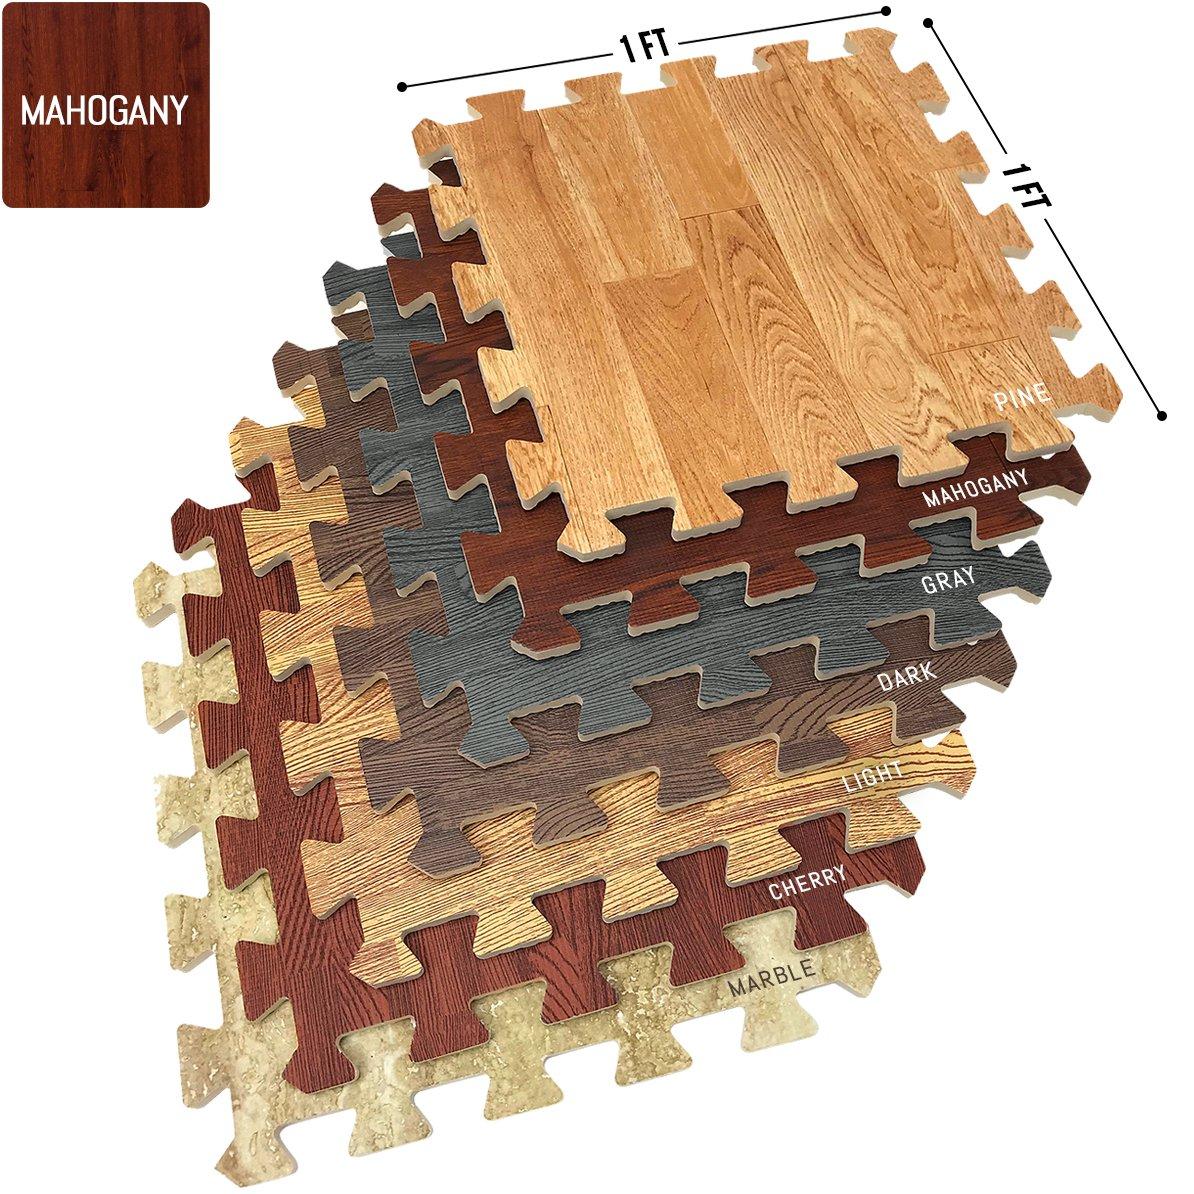 Sorbus Wood Grain Floor Mats Foam Interlocking Mats Each Tile 3//8-Inch Thick Flooring Wood Mat Tiles Home Office Playroom Basement Trade Show